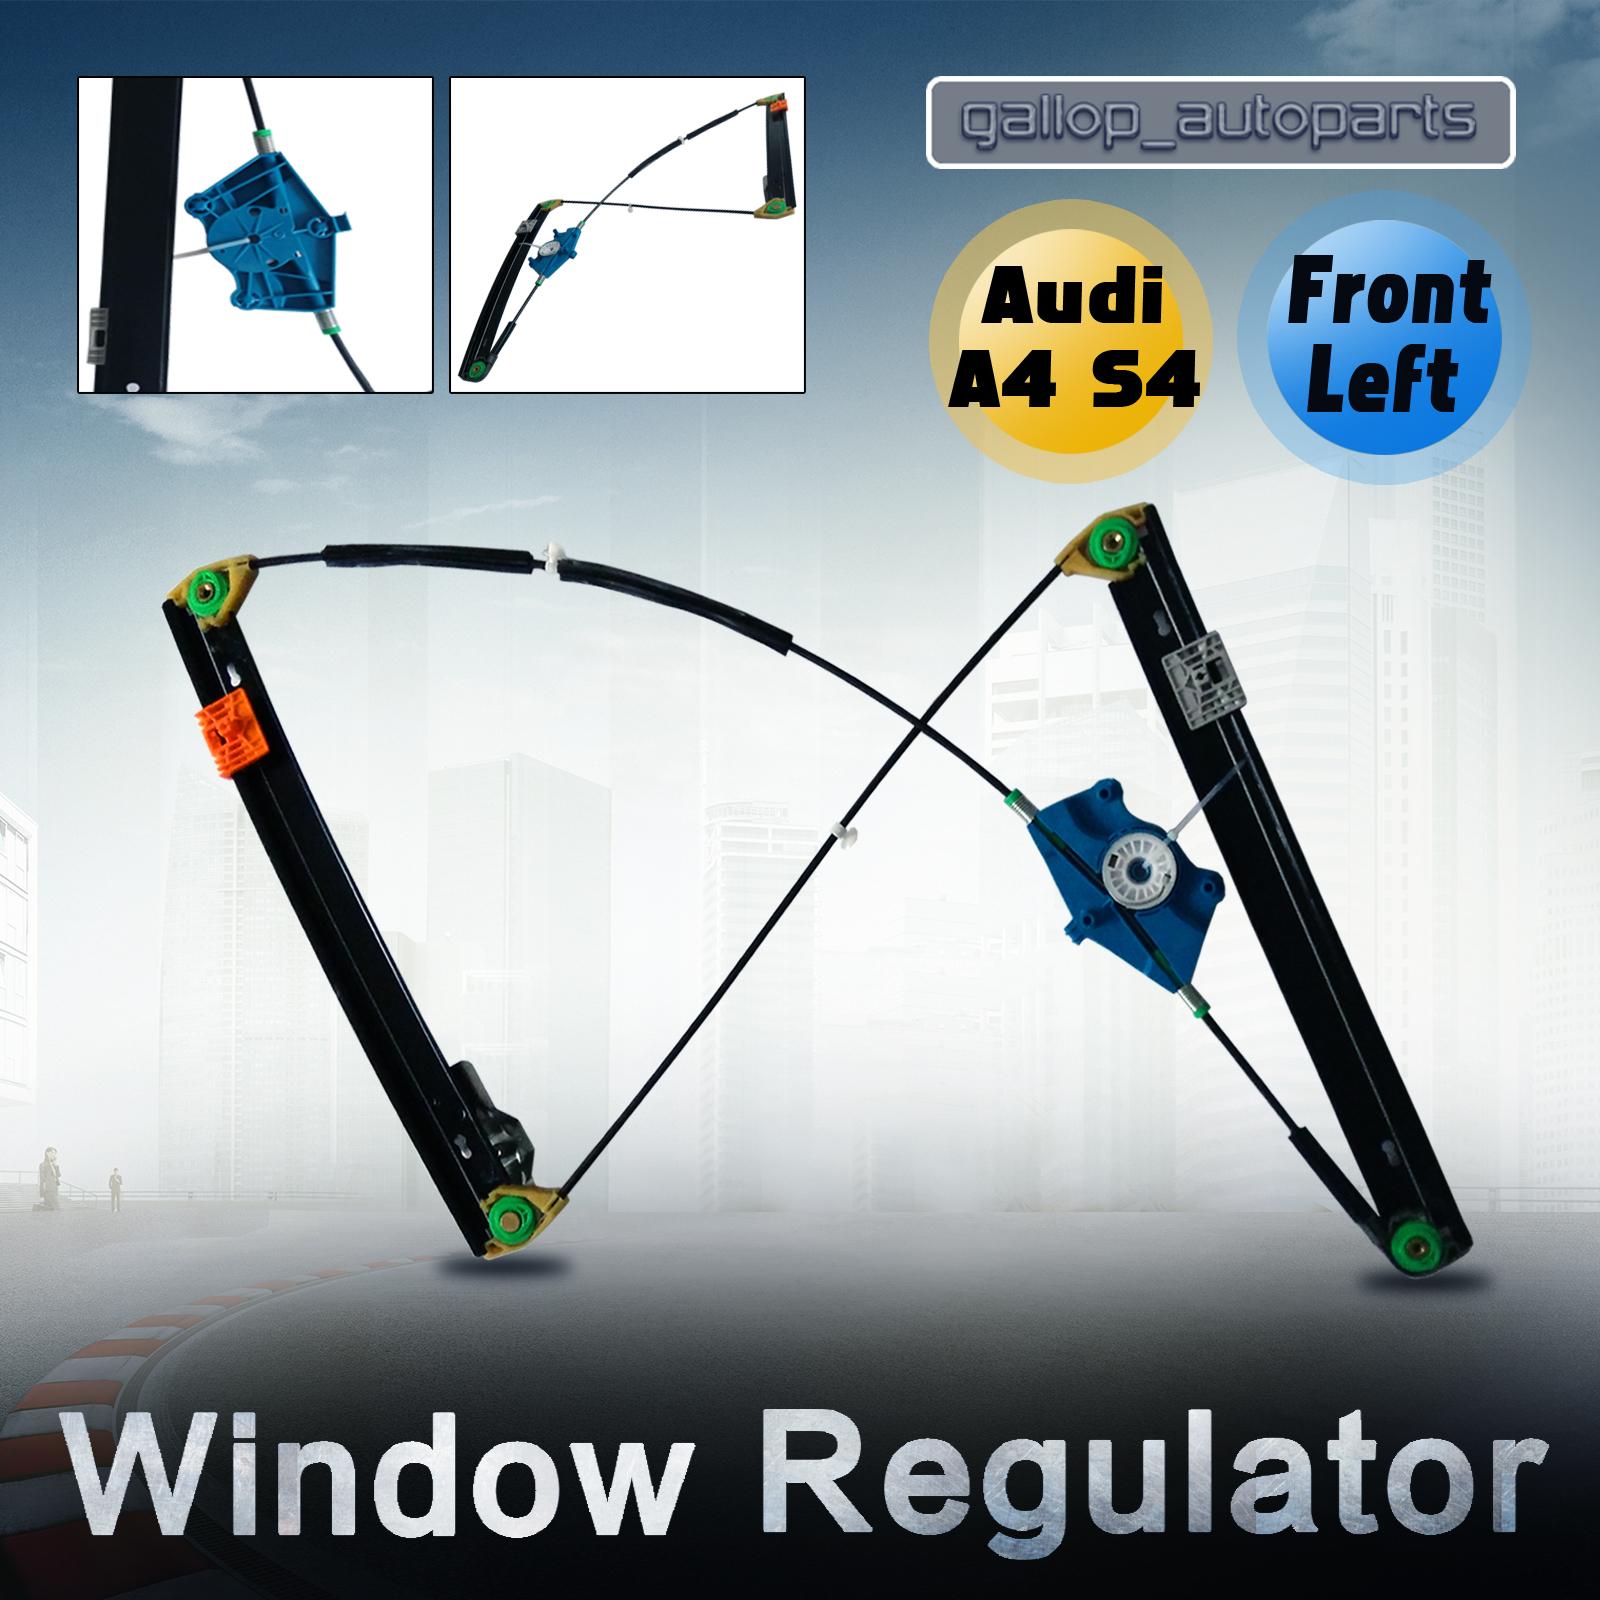 Window regulator audi a4 s4 02 08 passengers side front for 2002 audi a4 rear window regulator